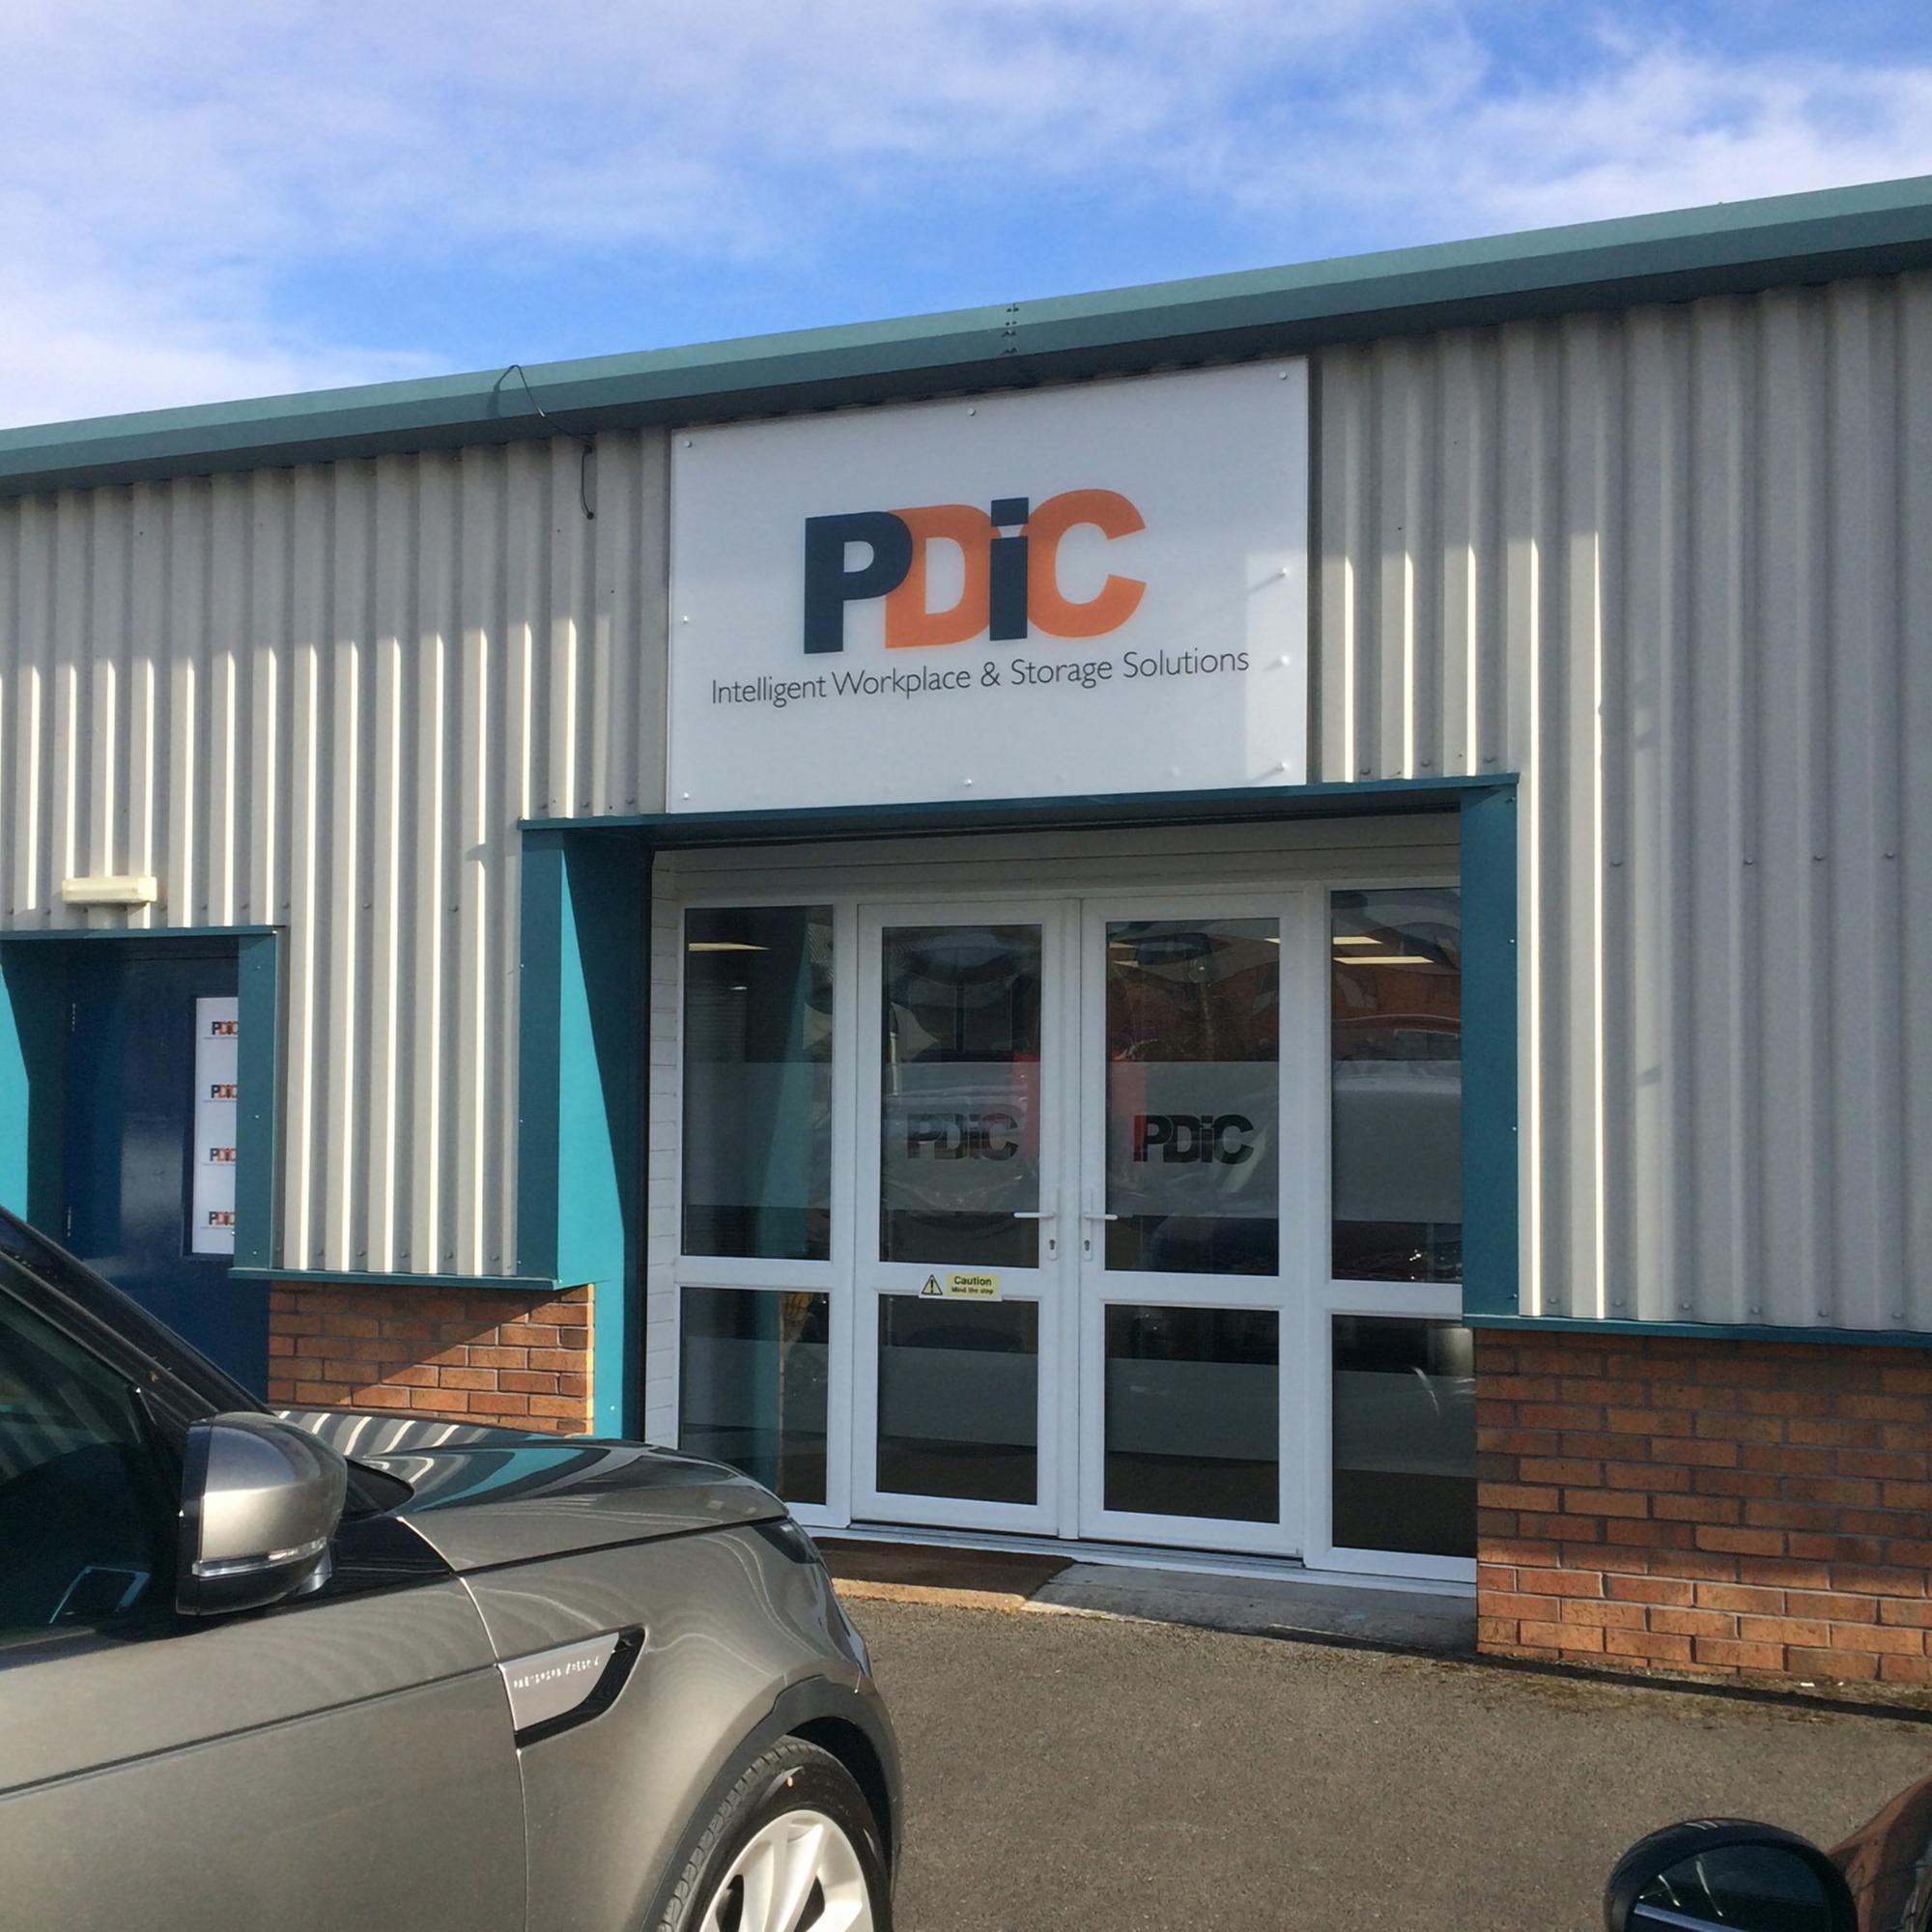 PDiC Group Corporate Identity